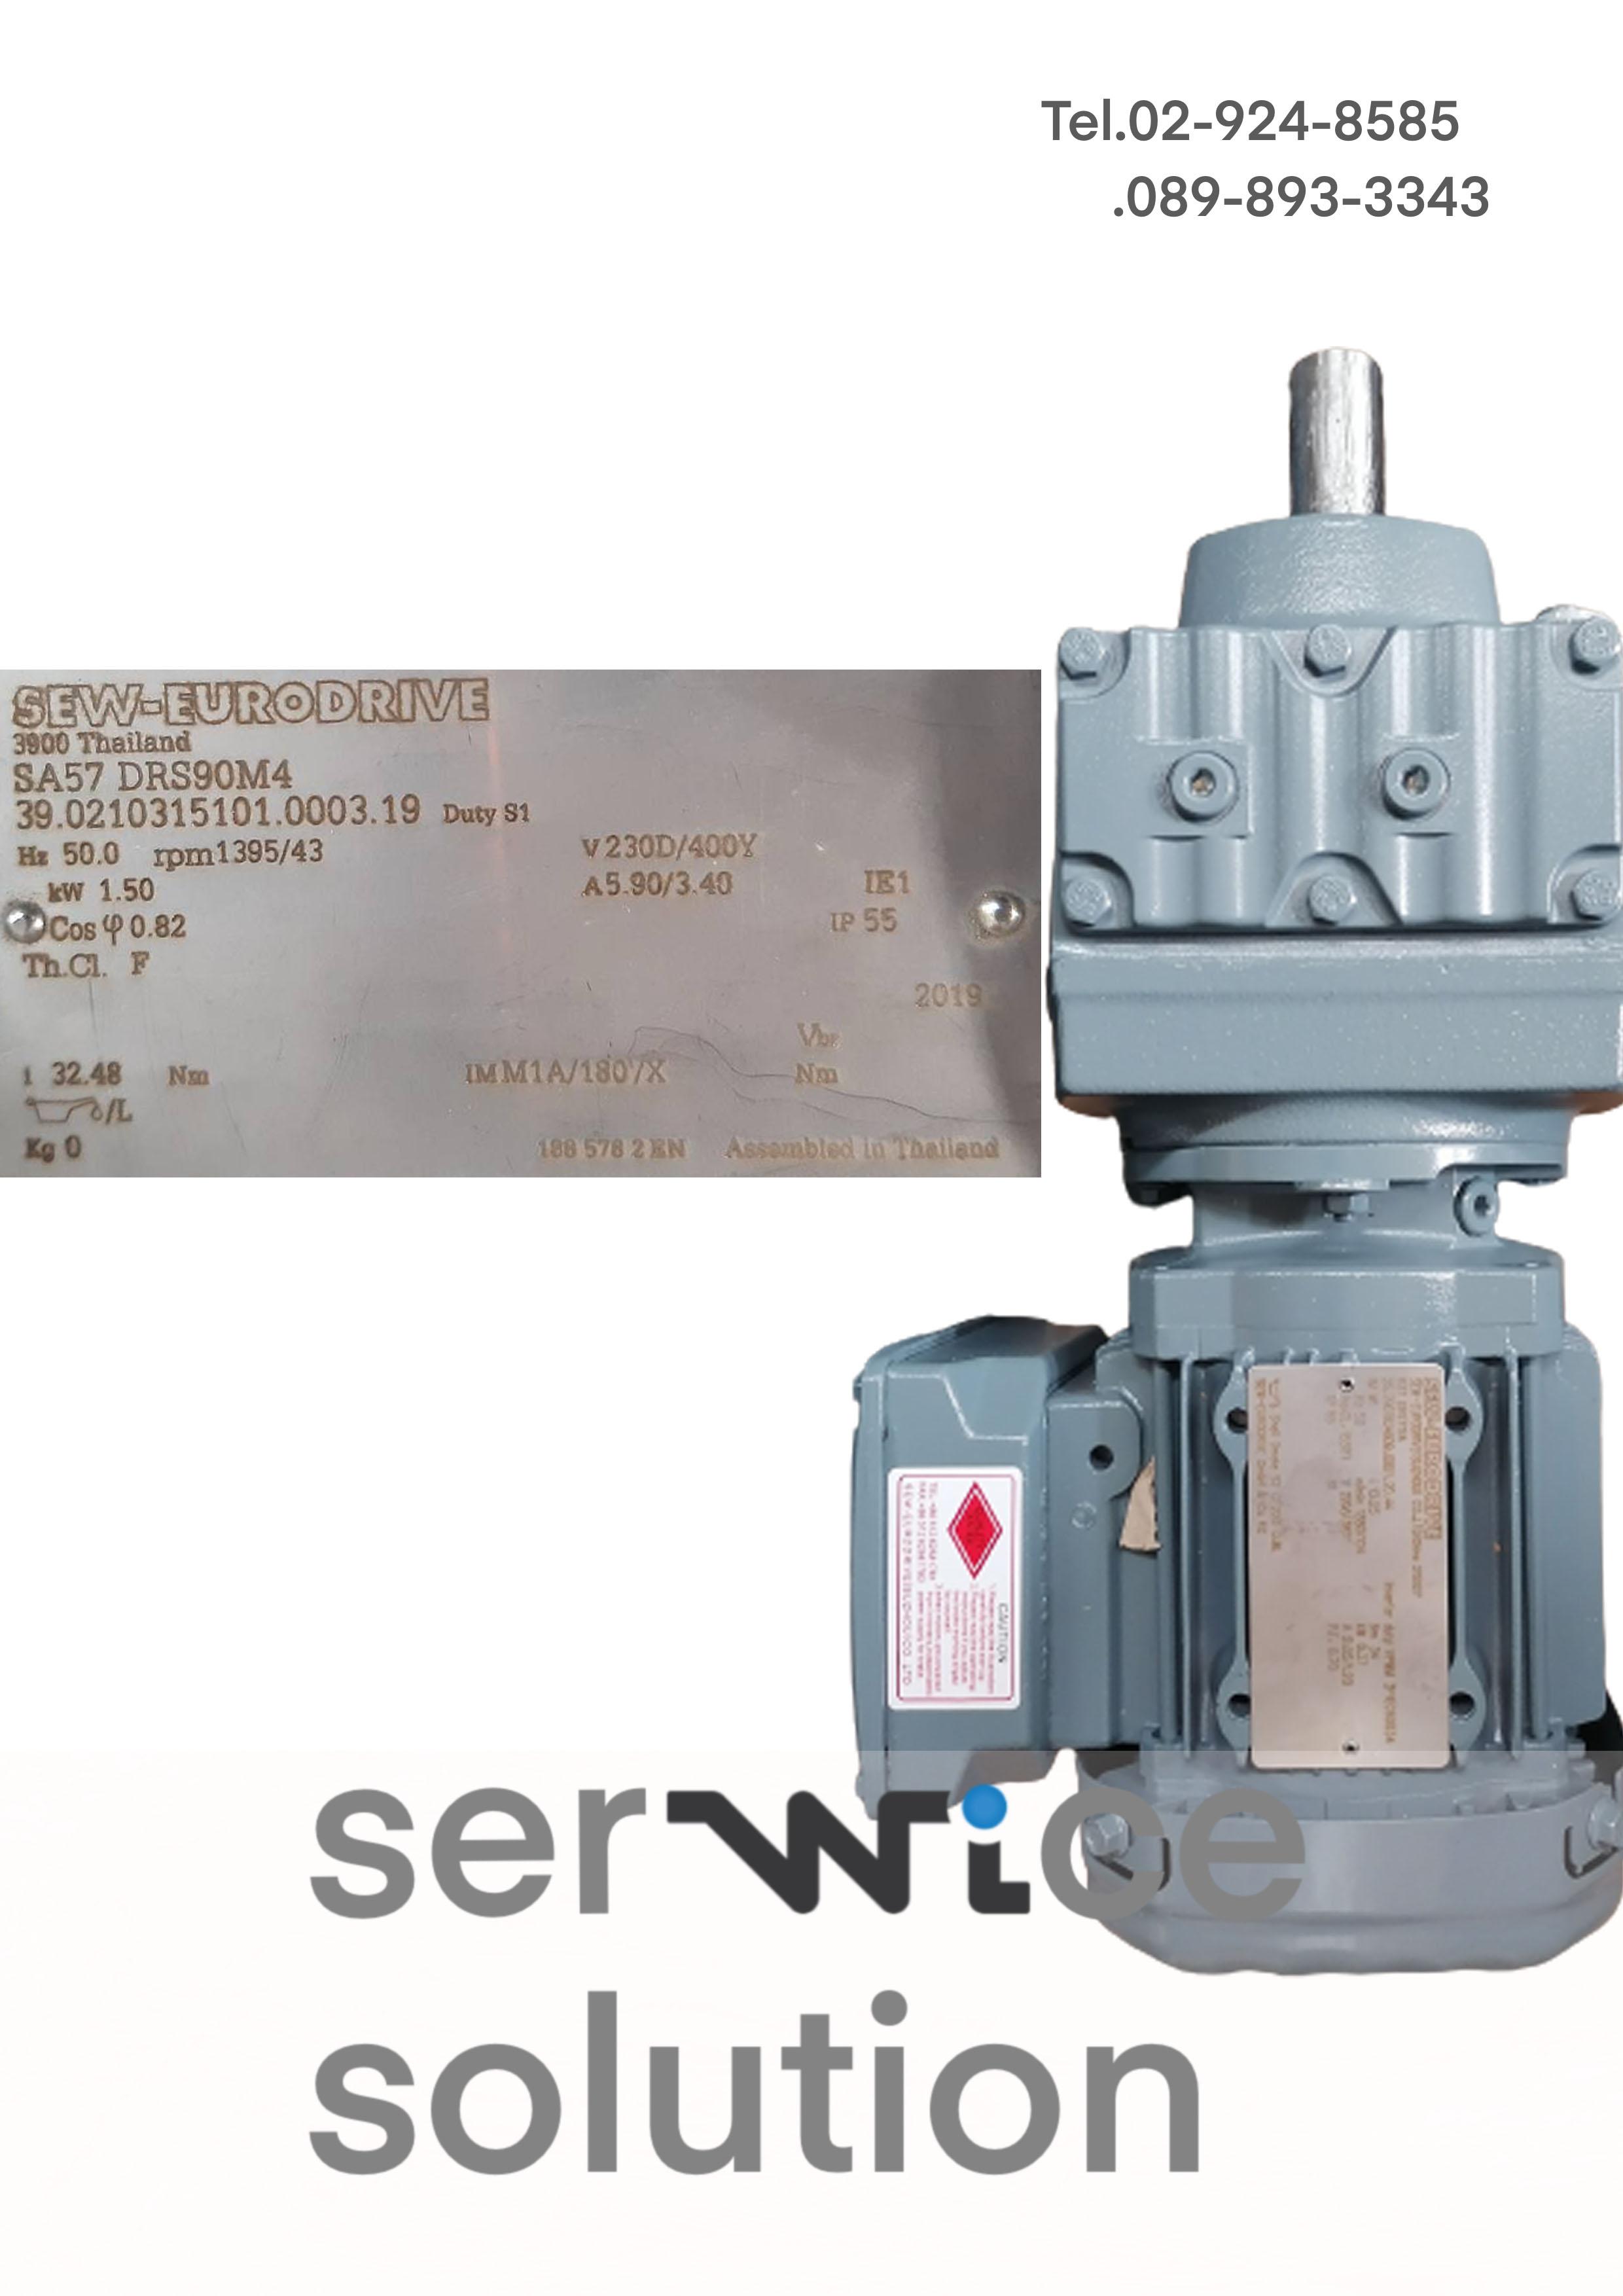 SA57DRS90M4-1.5Kw-48Rpm-M1A-270X-Hollow Shaft35 [MOS-SA57DRS90M4-1.5Kw]